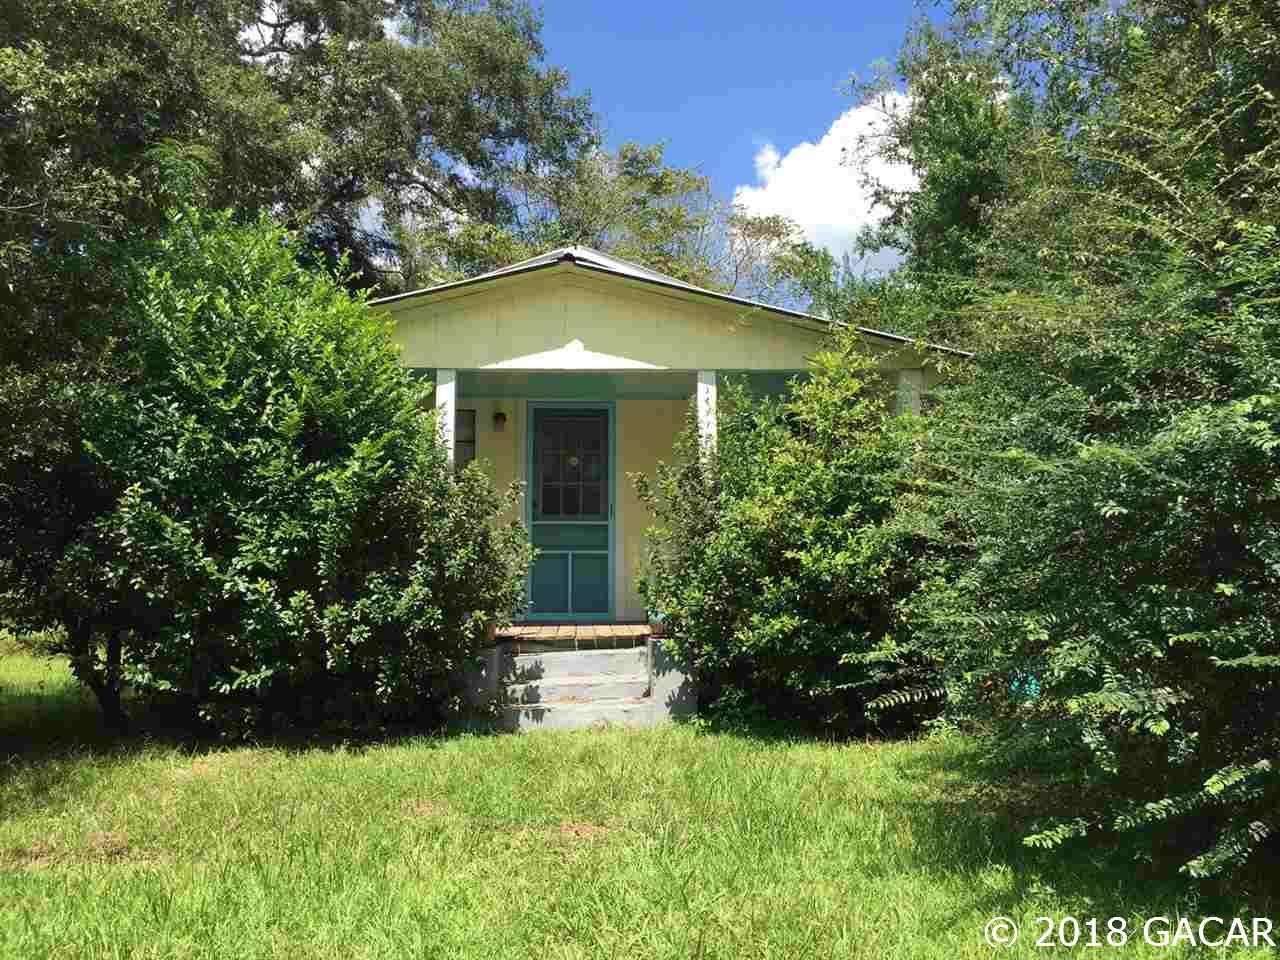 14226 NW 154 Place, Alachua, Florida